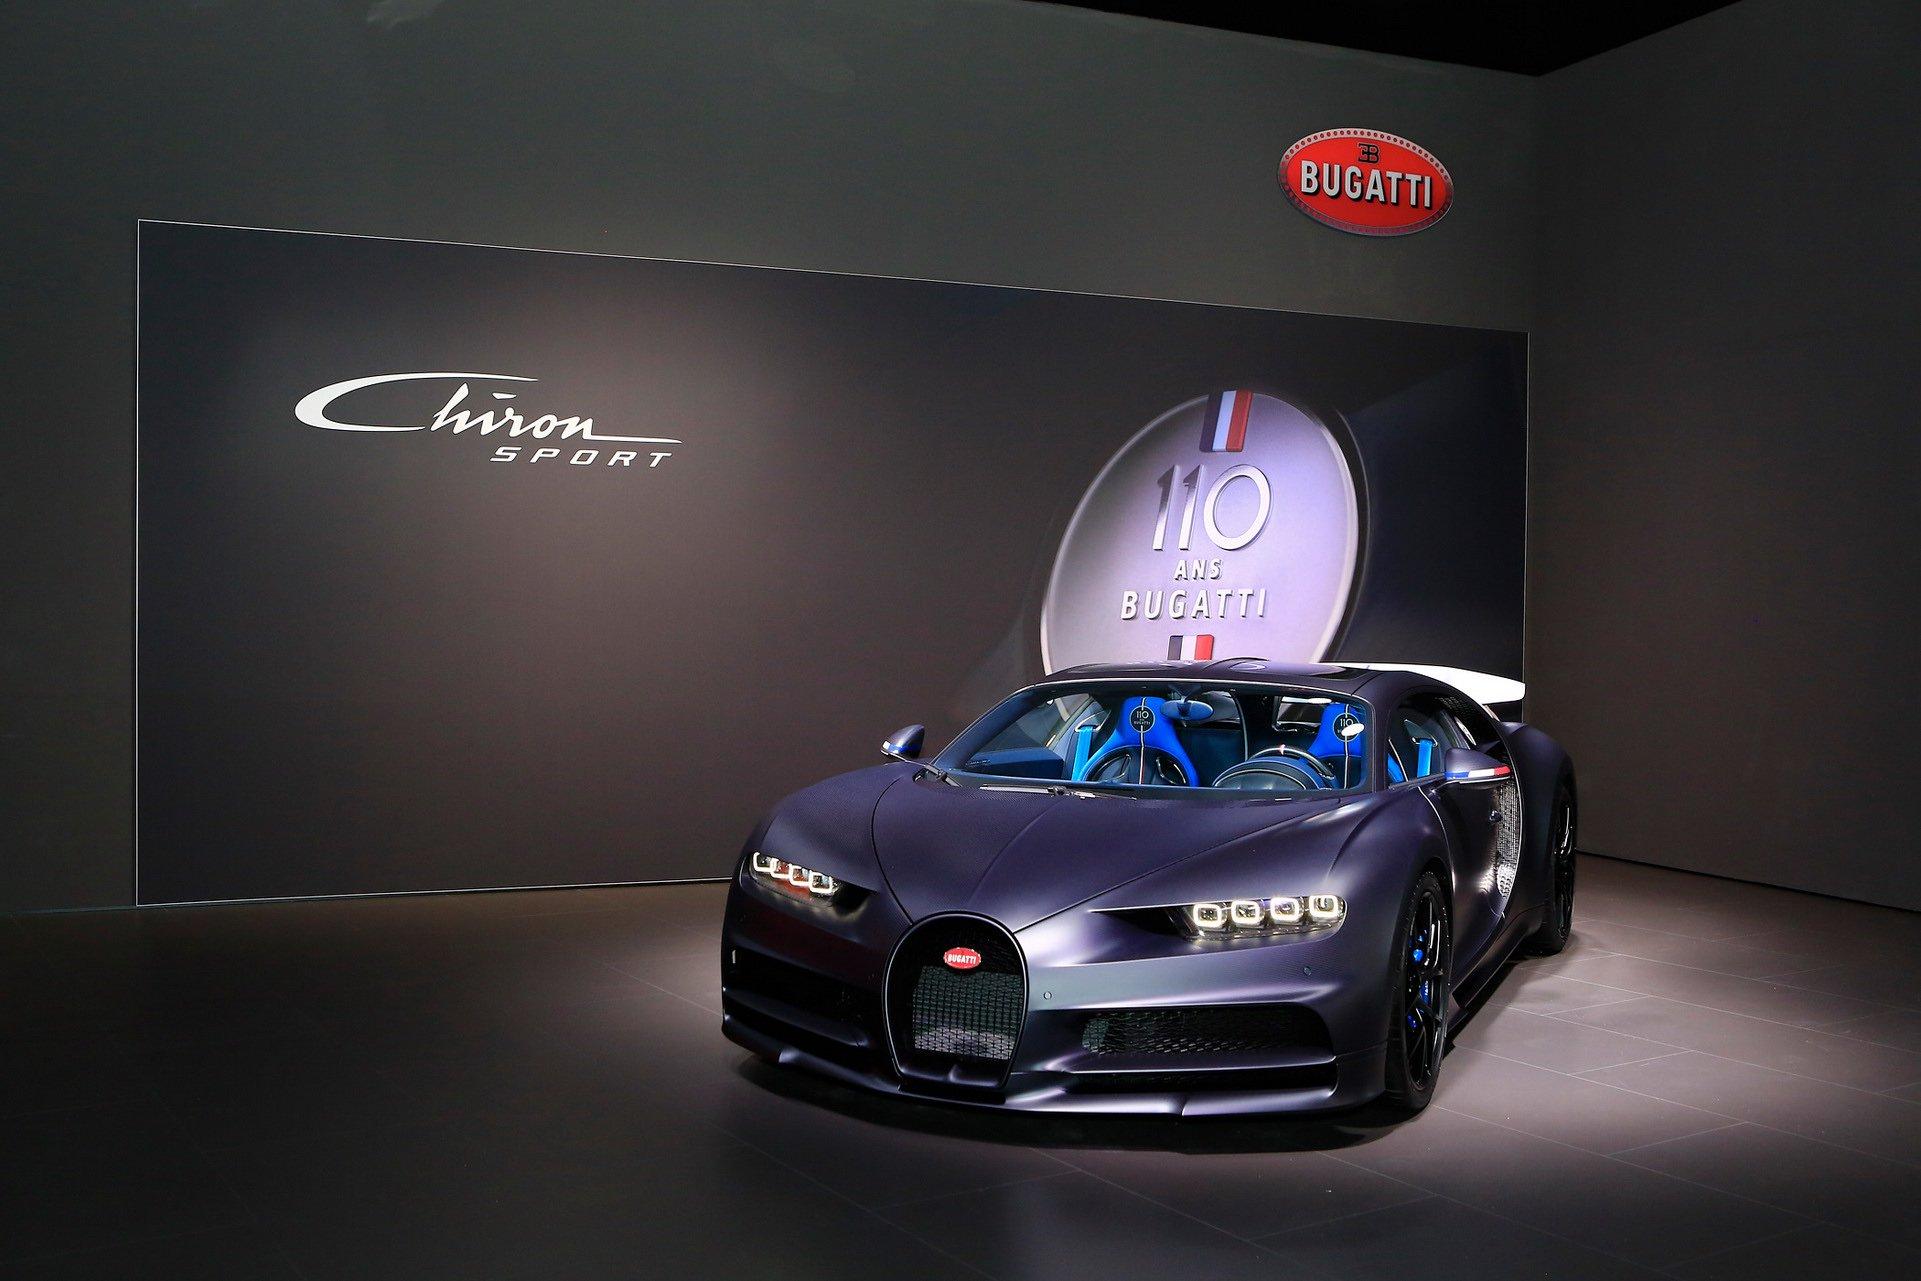 56f64e59-bugatti-chiron-sport-110-ans-14.jpg